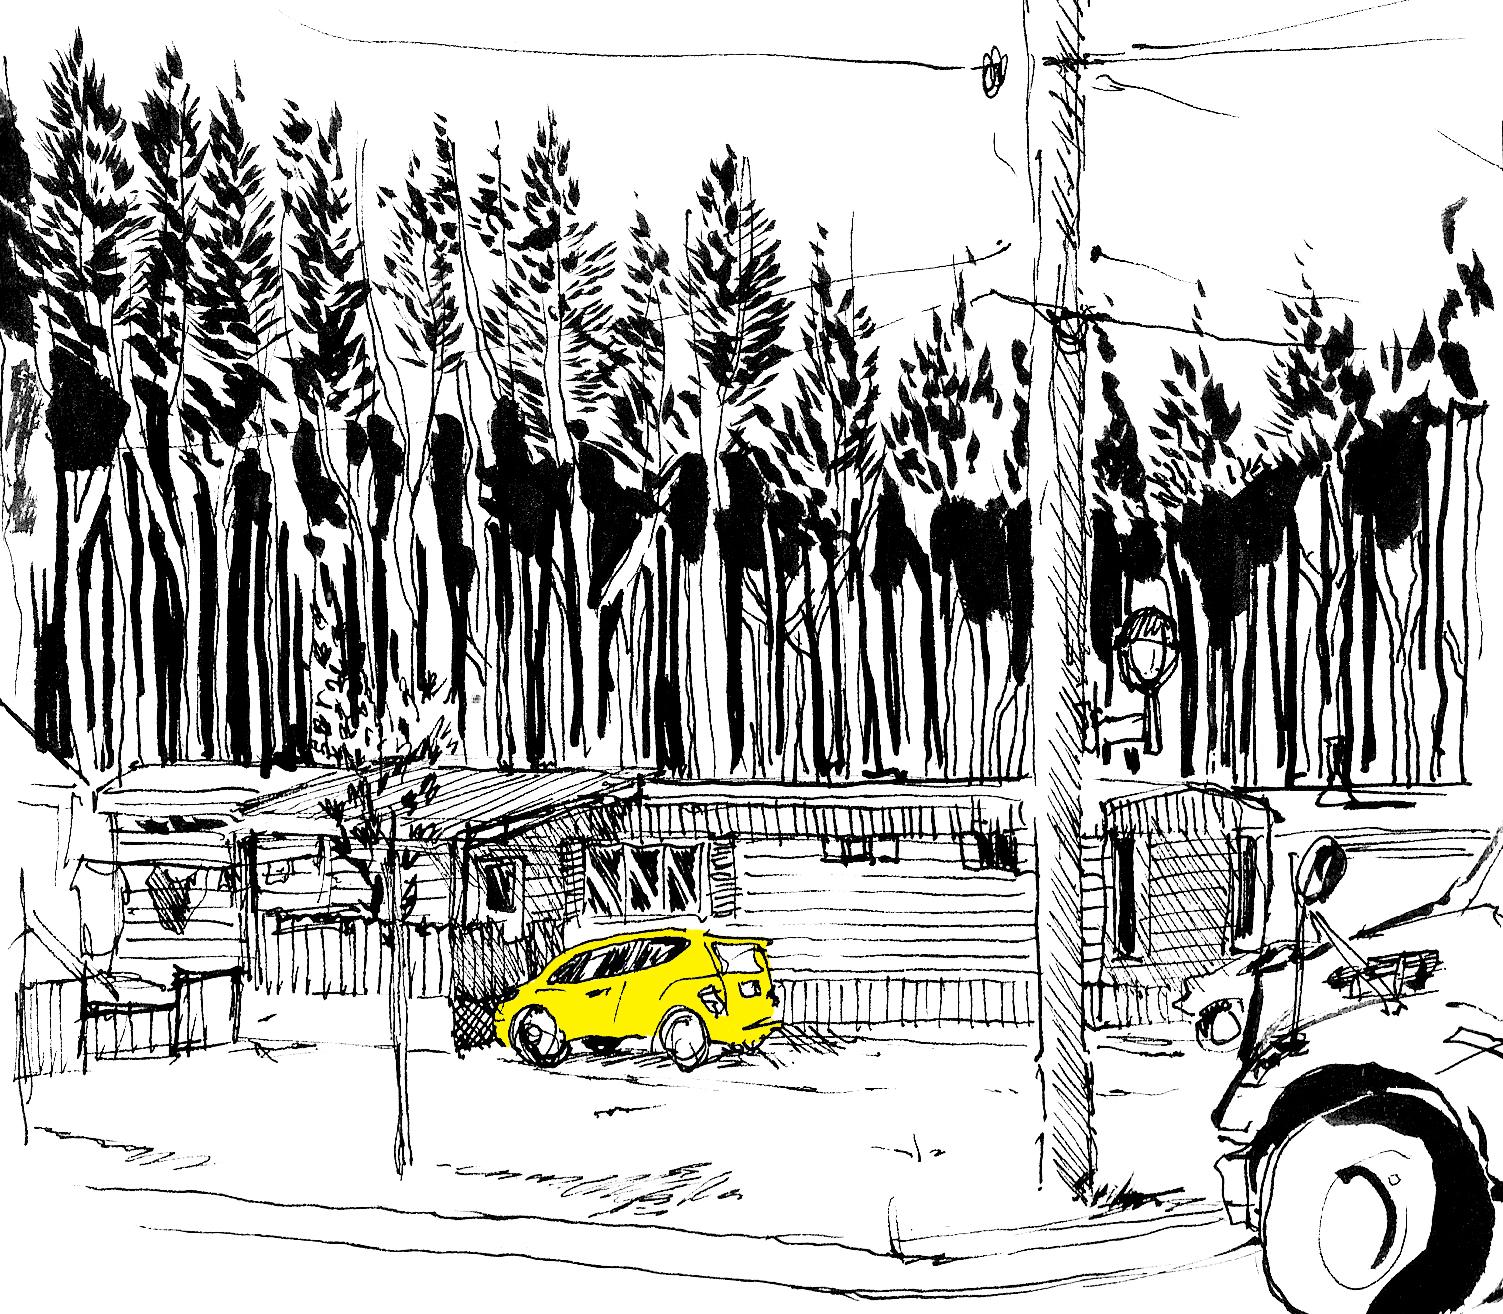 trailer park home copy.jpg